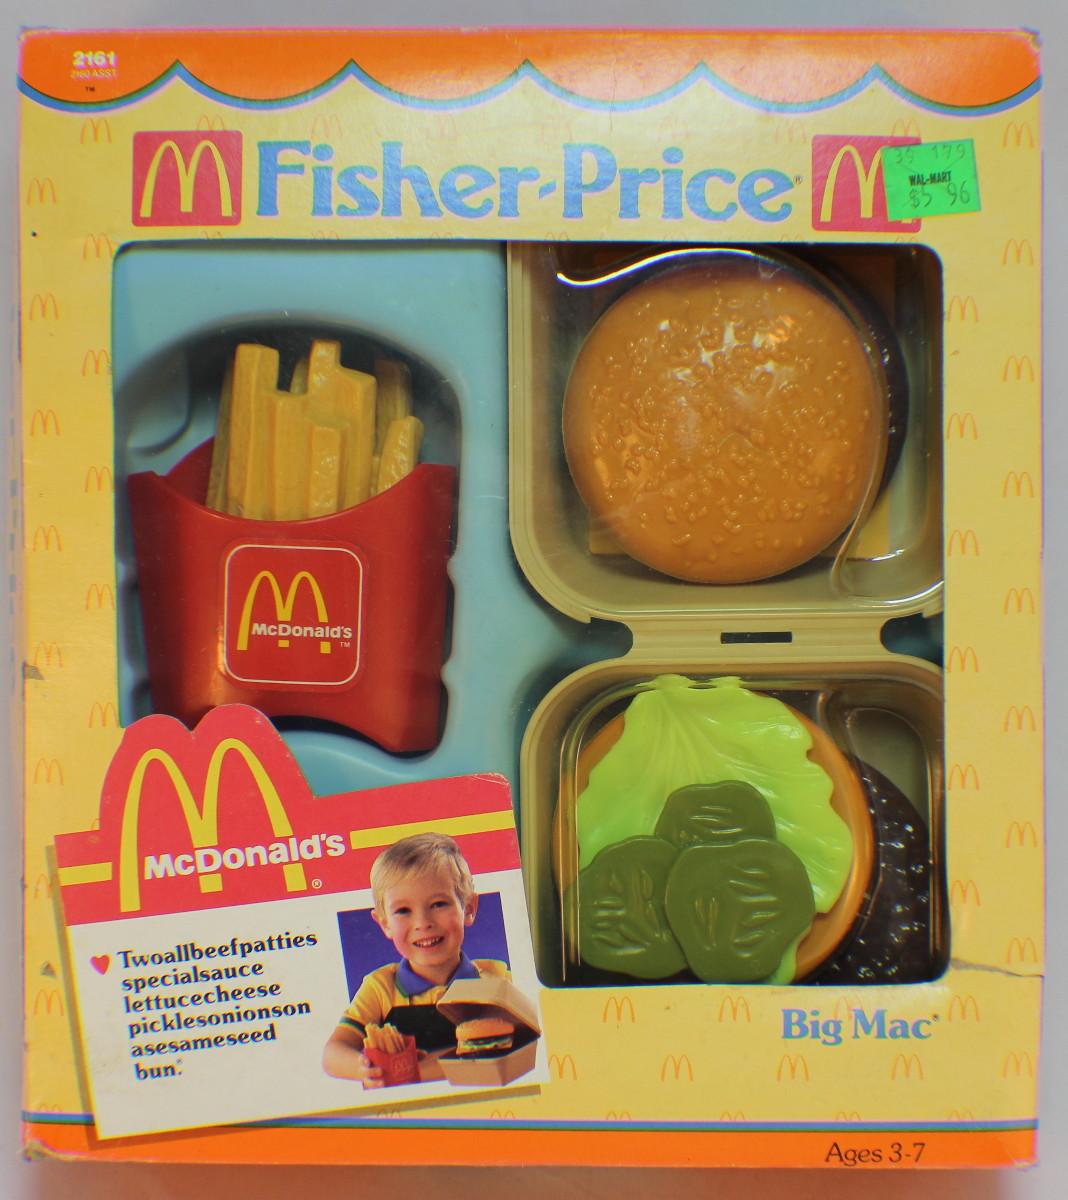 Fisher price fun with food mcdonalds big mac 2161 1988 - Cuisine fisher price bilingue ...